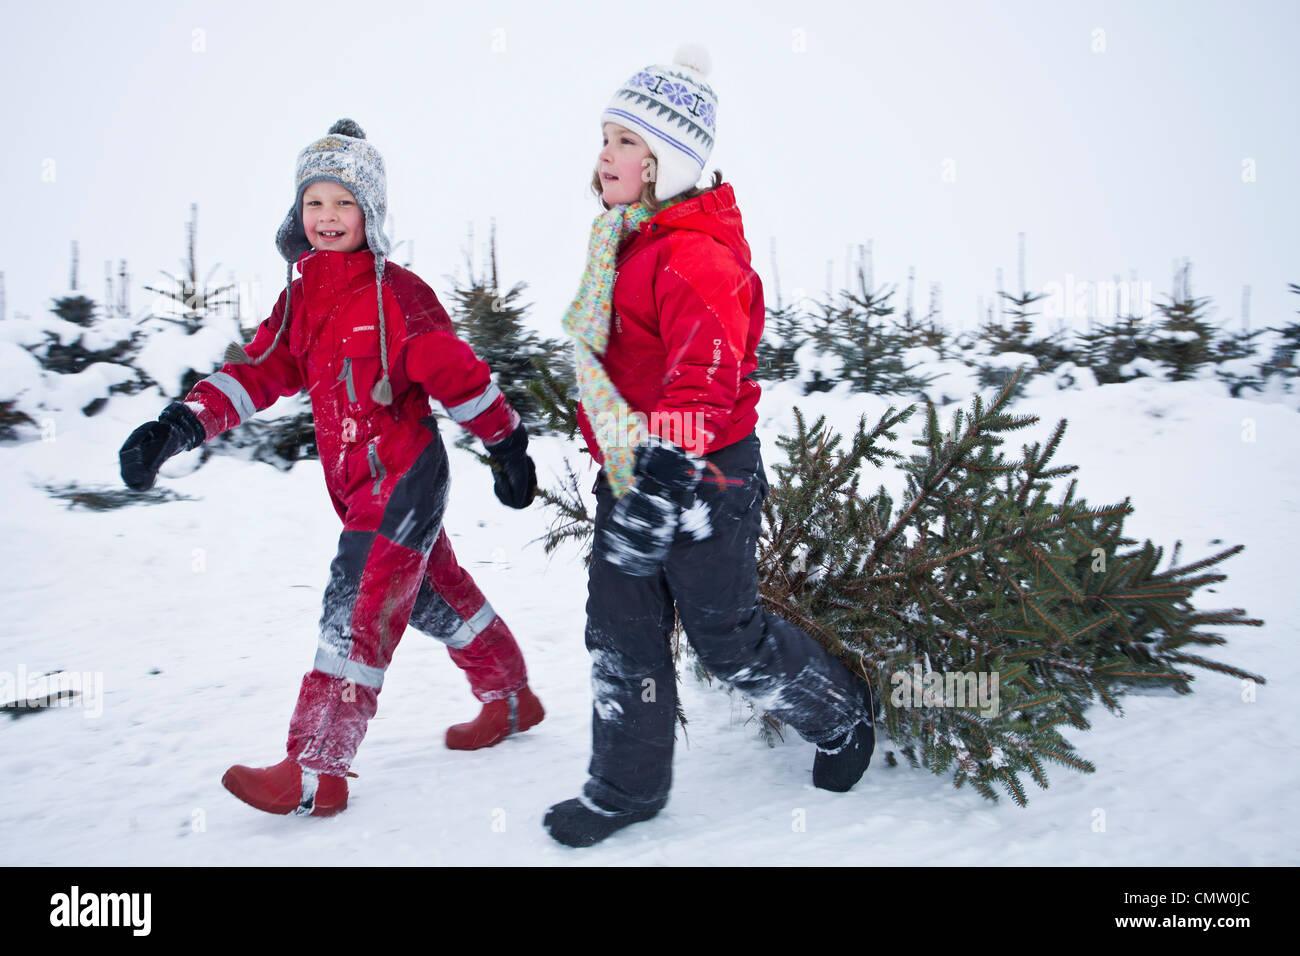 Children pulling Christmas tree - Stock Image